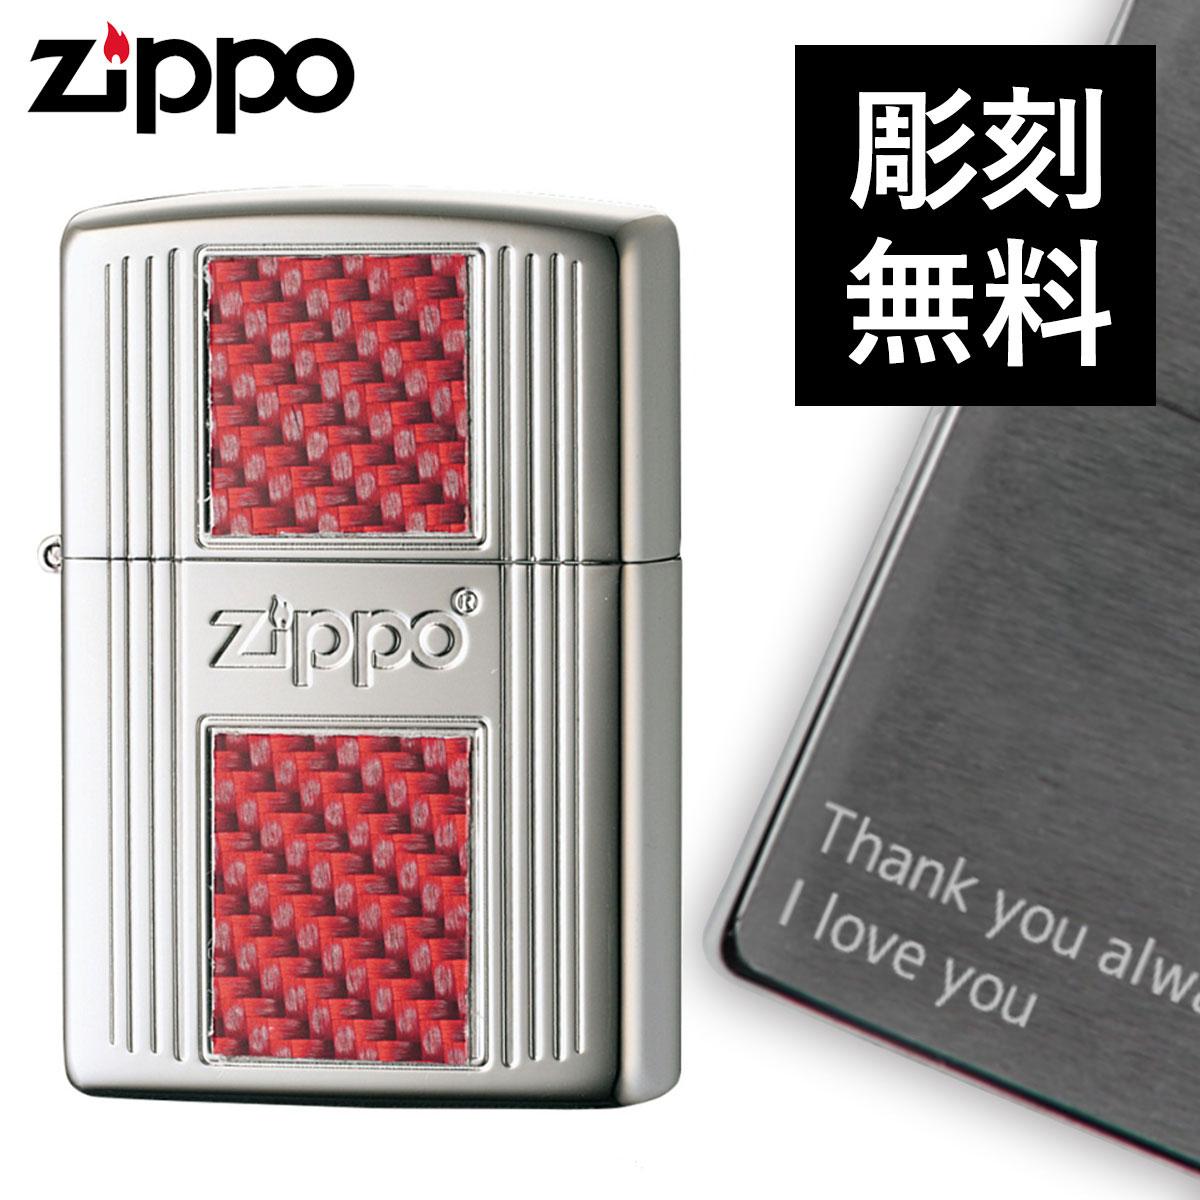 zippo 名入れ ジッポー ライター CARBON INLAY 2PN-CRED 名入れ ギフト オイルライター ジッポライター ギフト プレゼント 彼氏 男性 メンズ